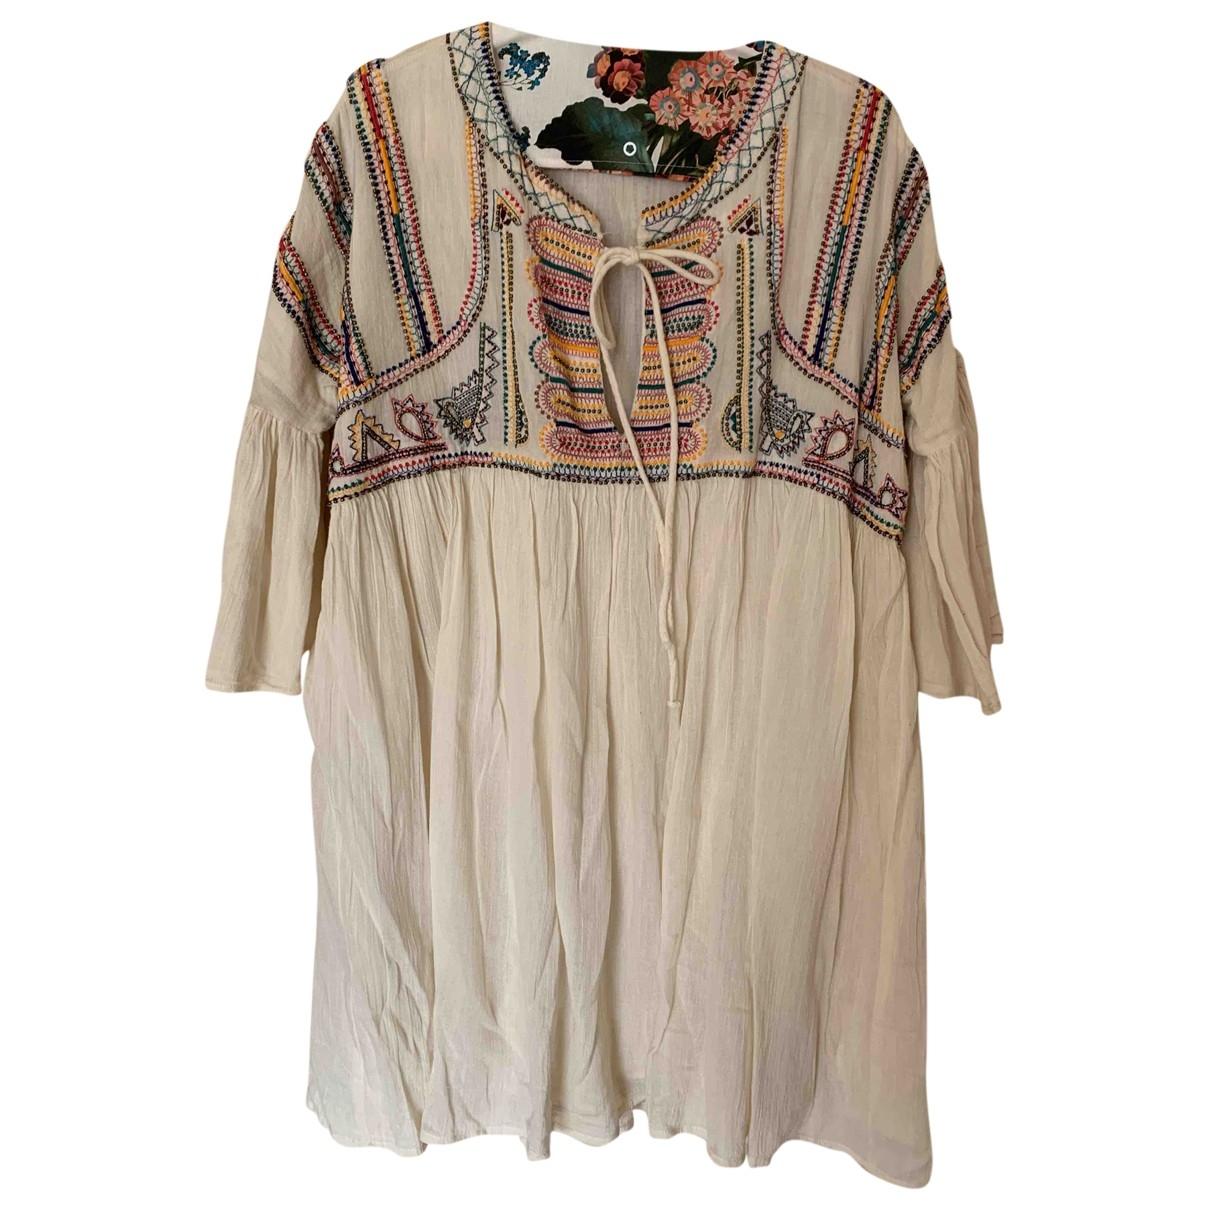 Zara \N Ecru Cotton dress for Women M International